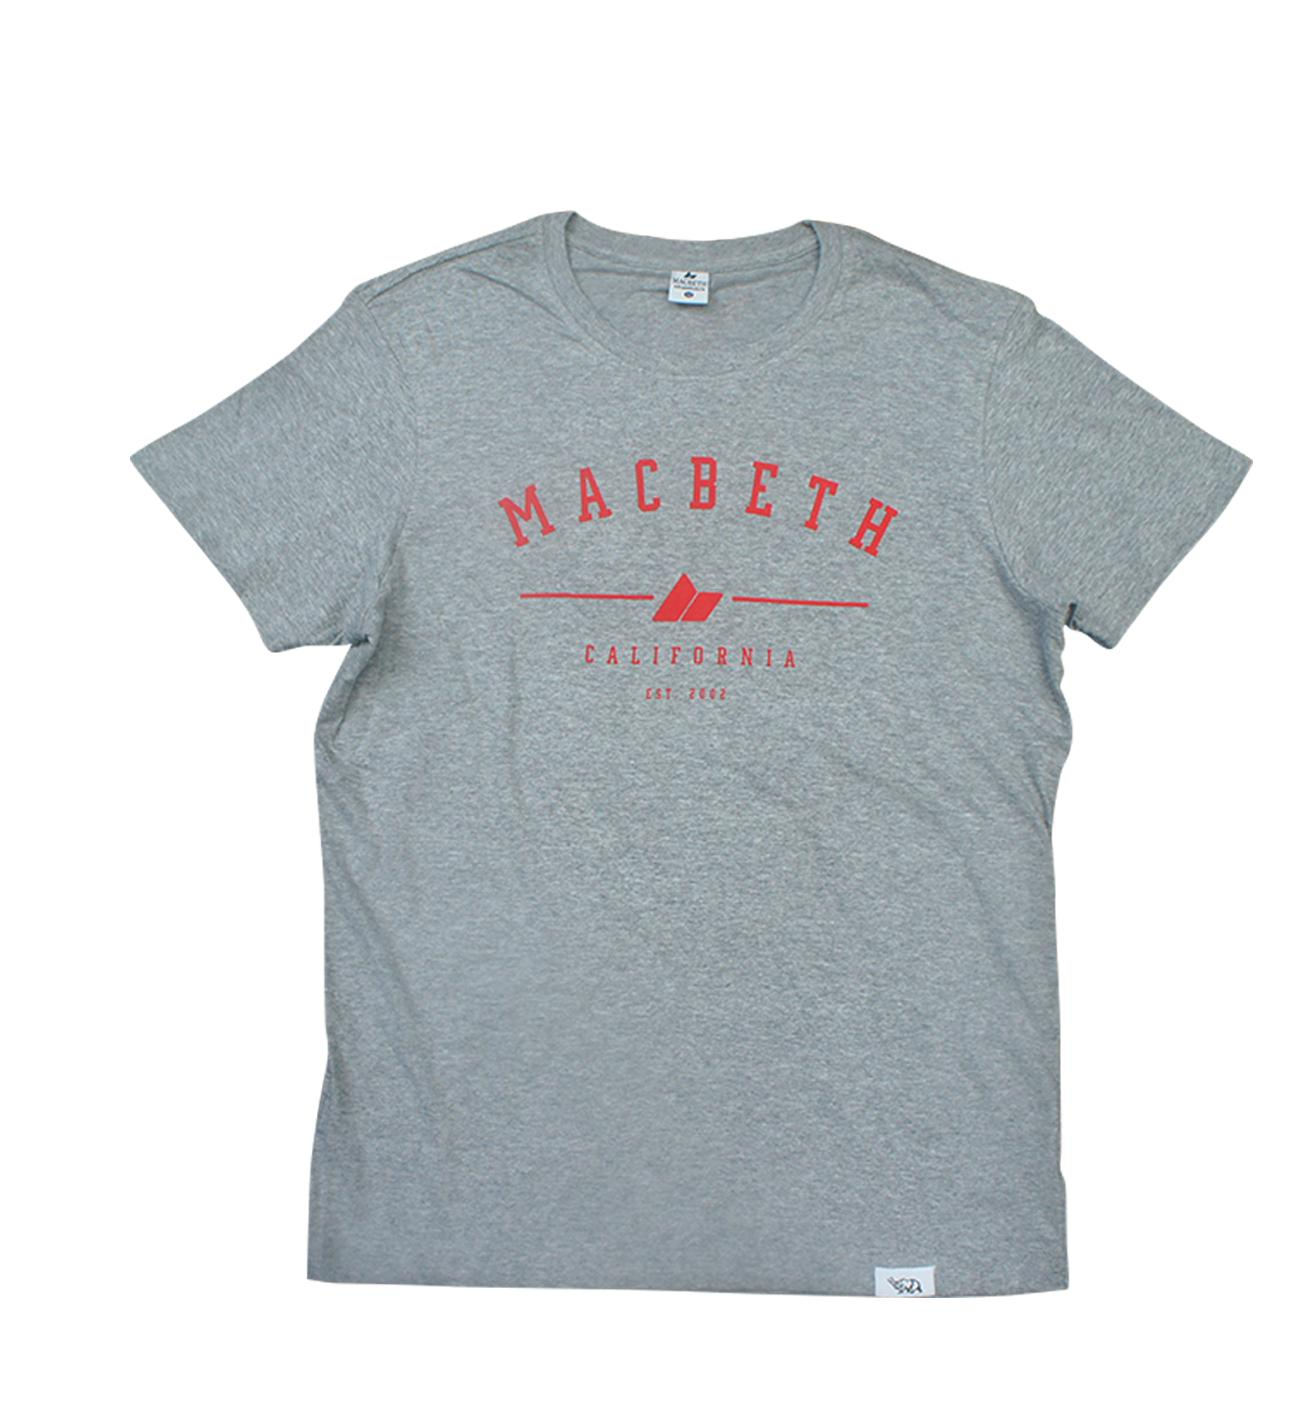 what does macbeth wear